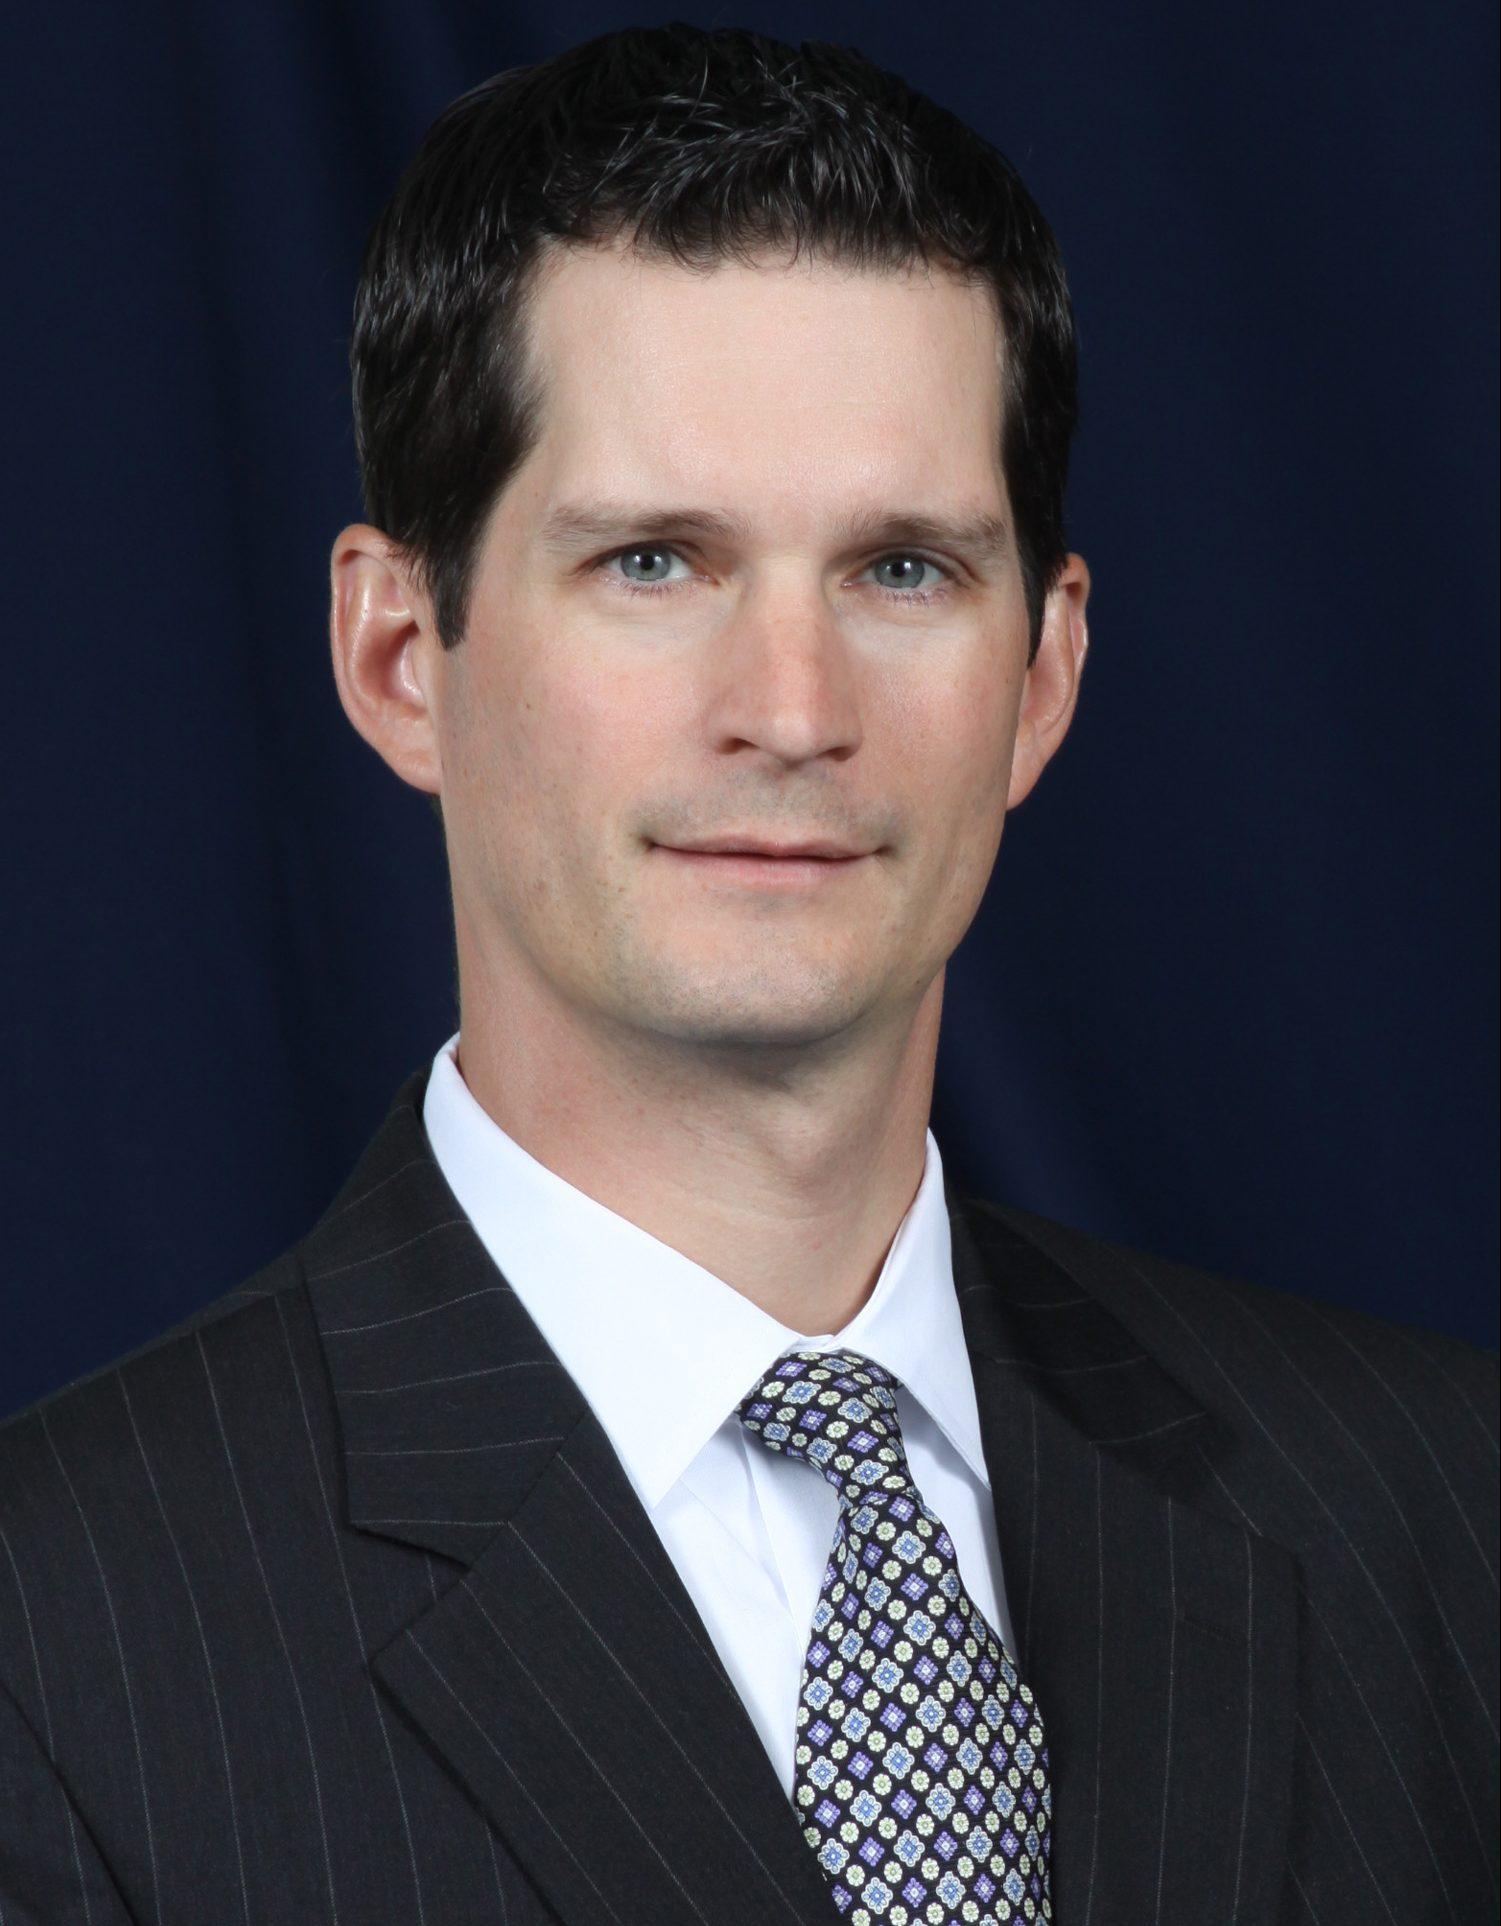 Philip J. Yakim